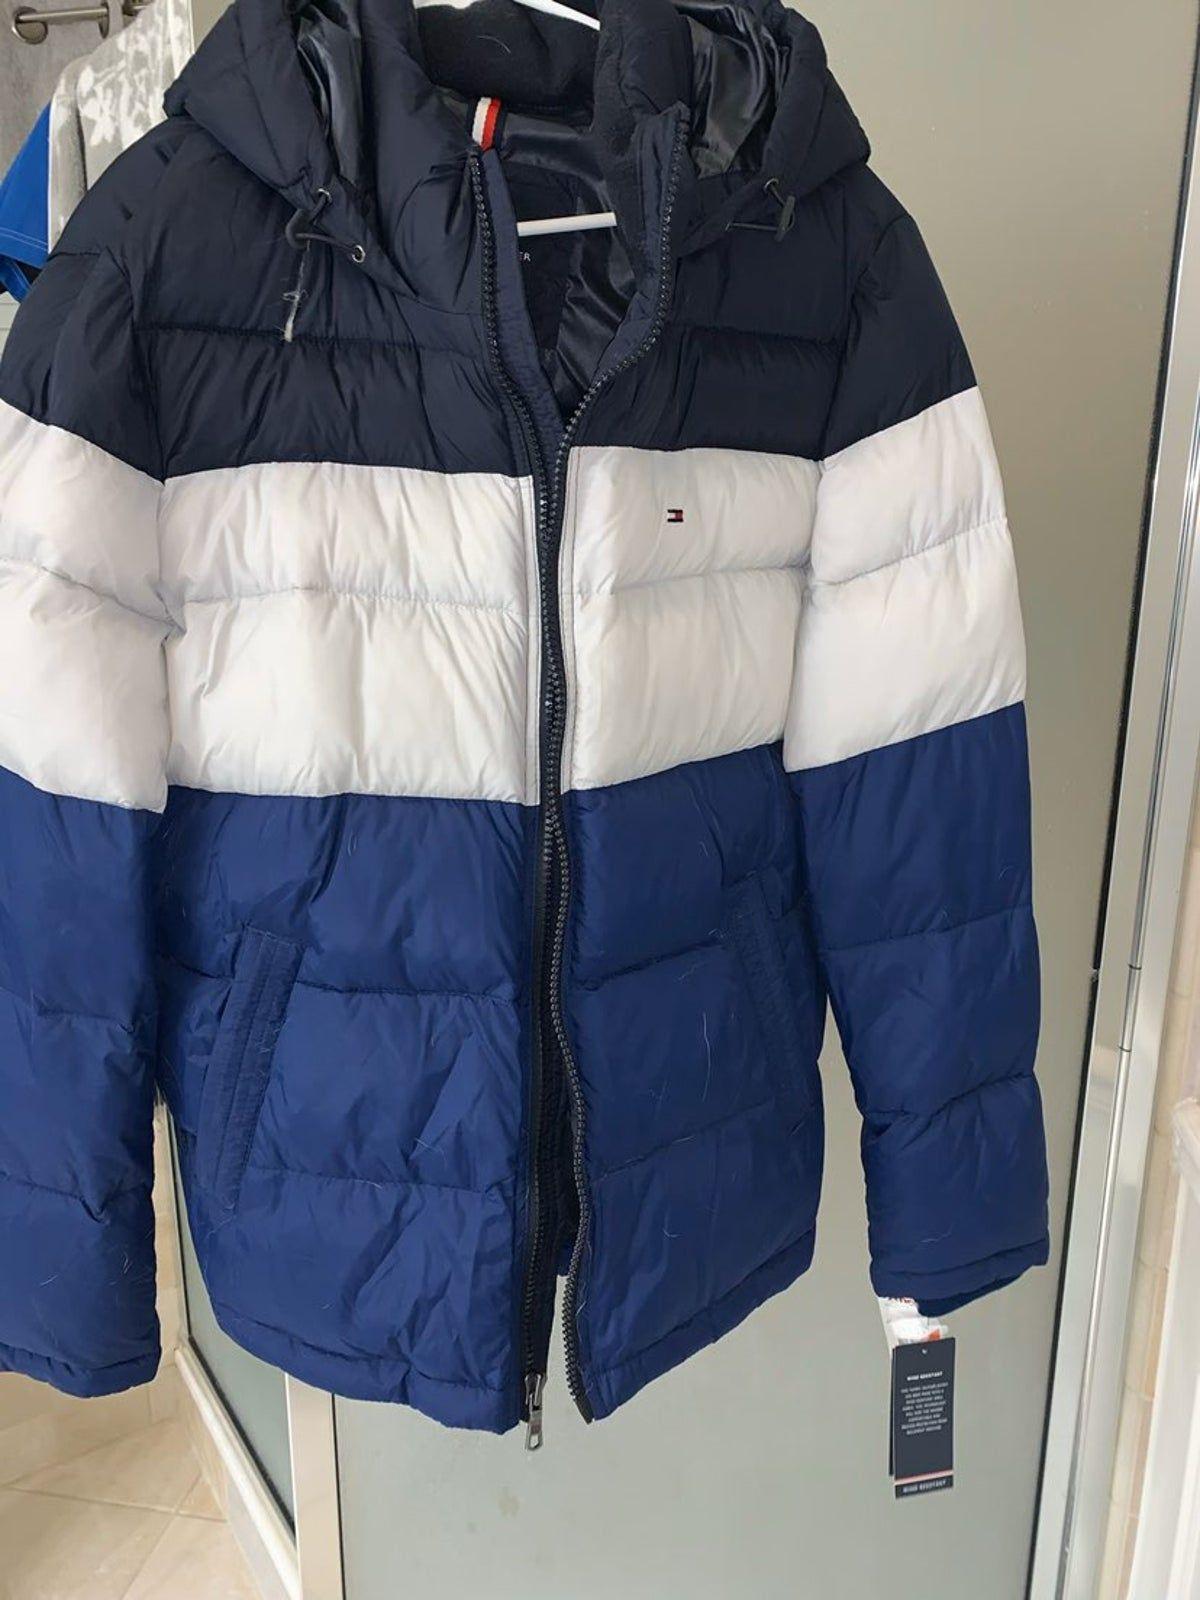 Tommy Hilfiger Winter Coat In 2021 Winter Coat Jackets Tommy Hilfiger [ 1600 x 1200 Pixel ]